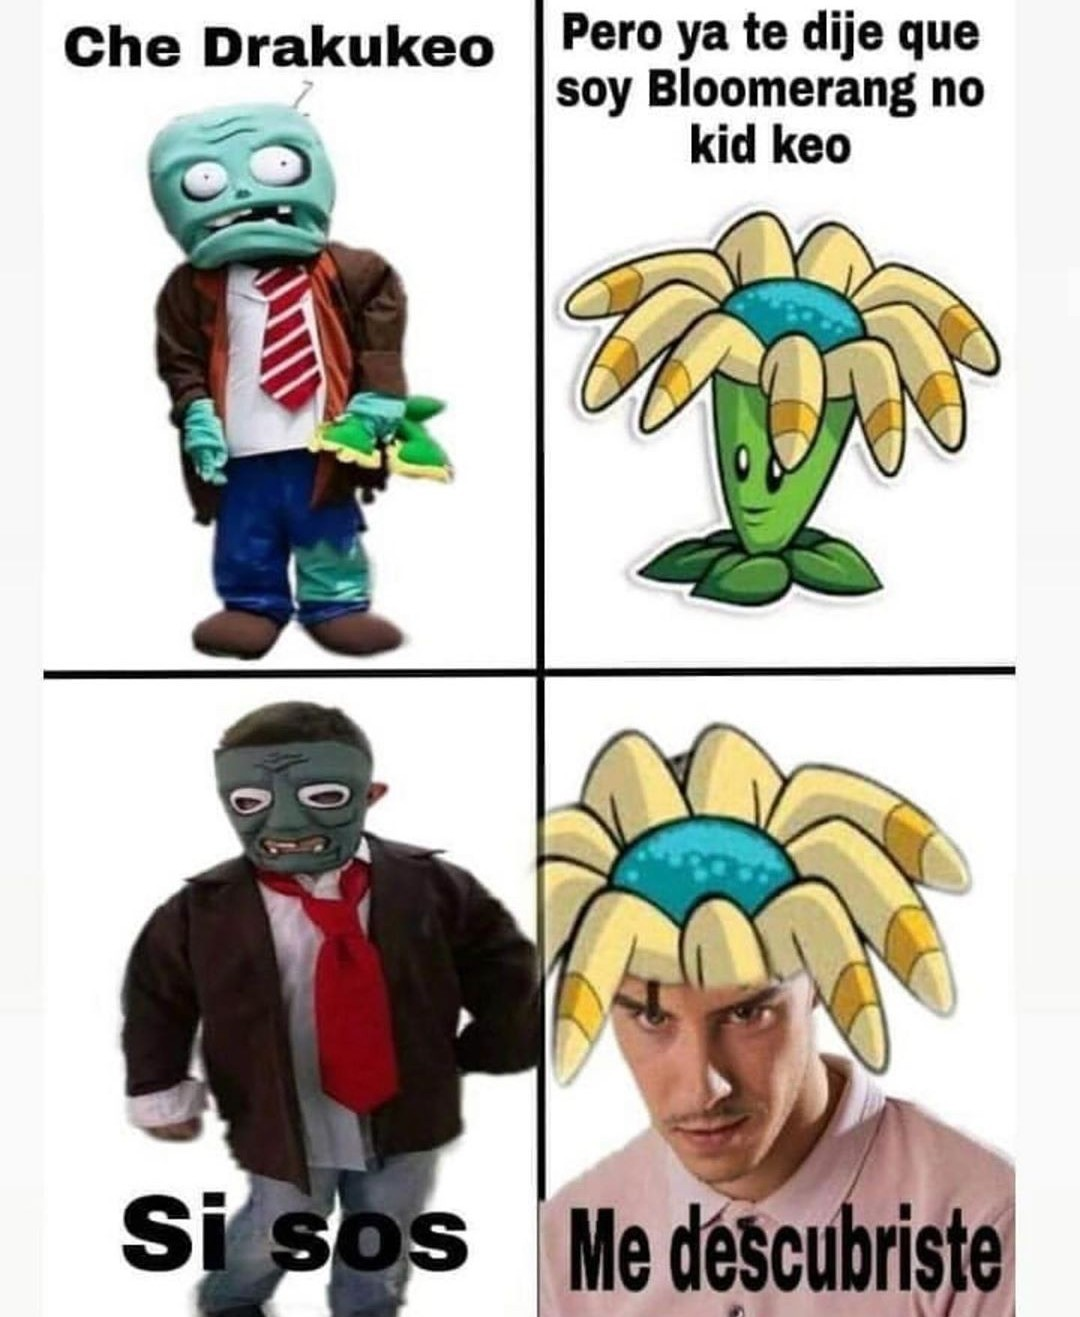 un capo el keo kid - meme